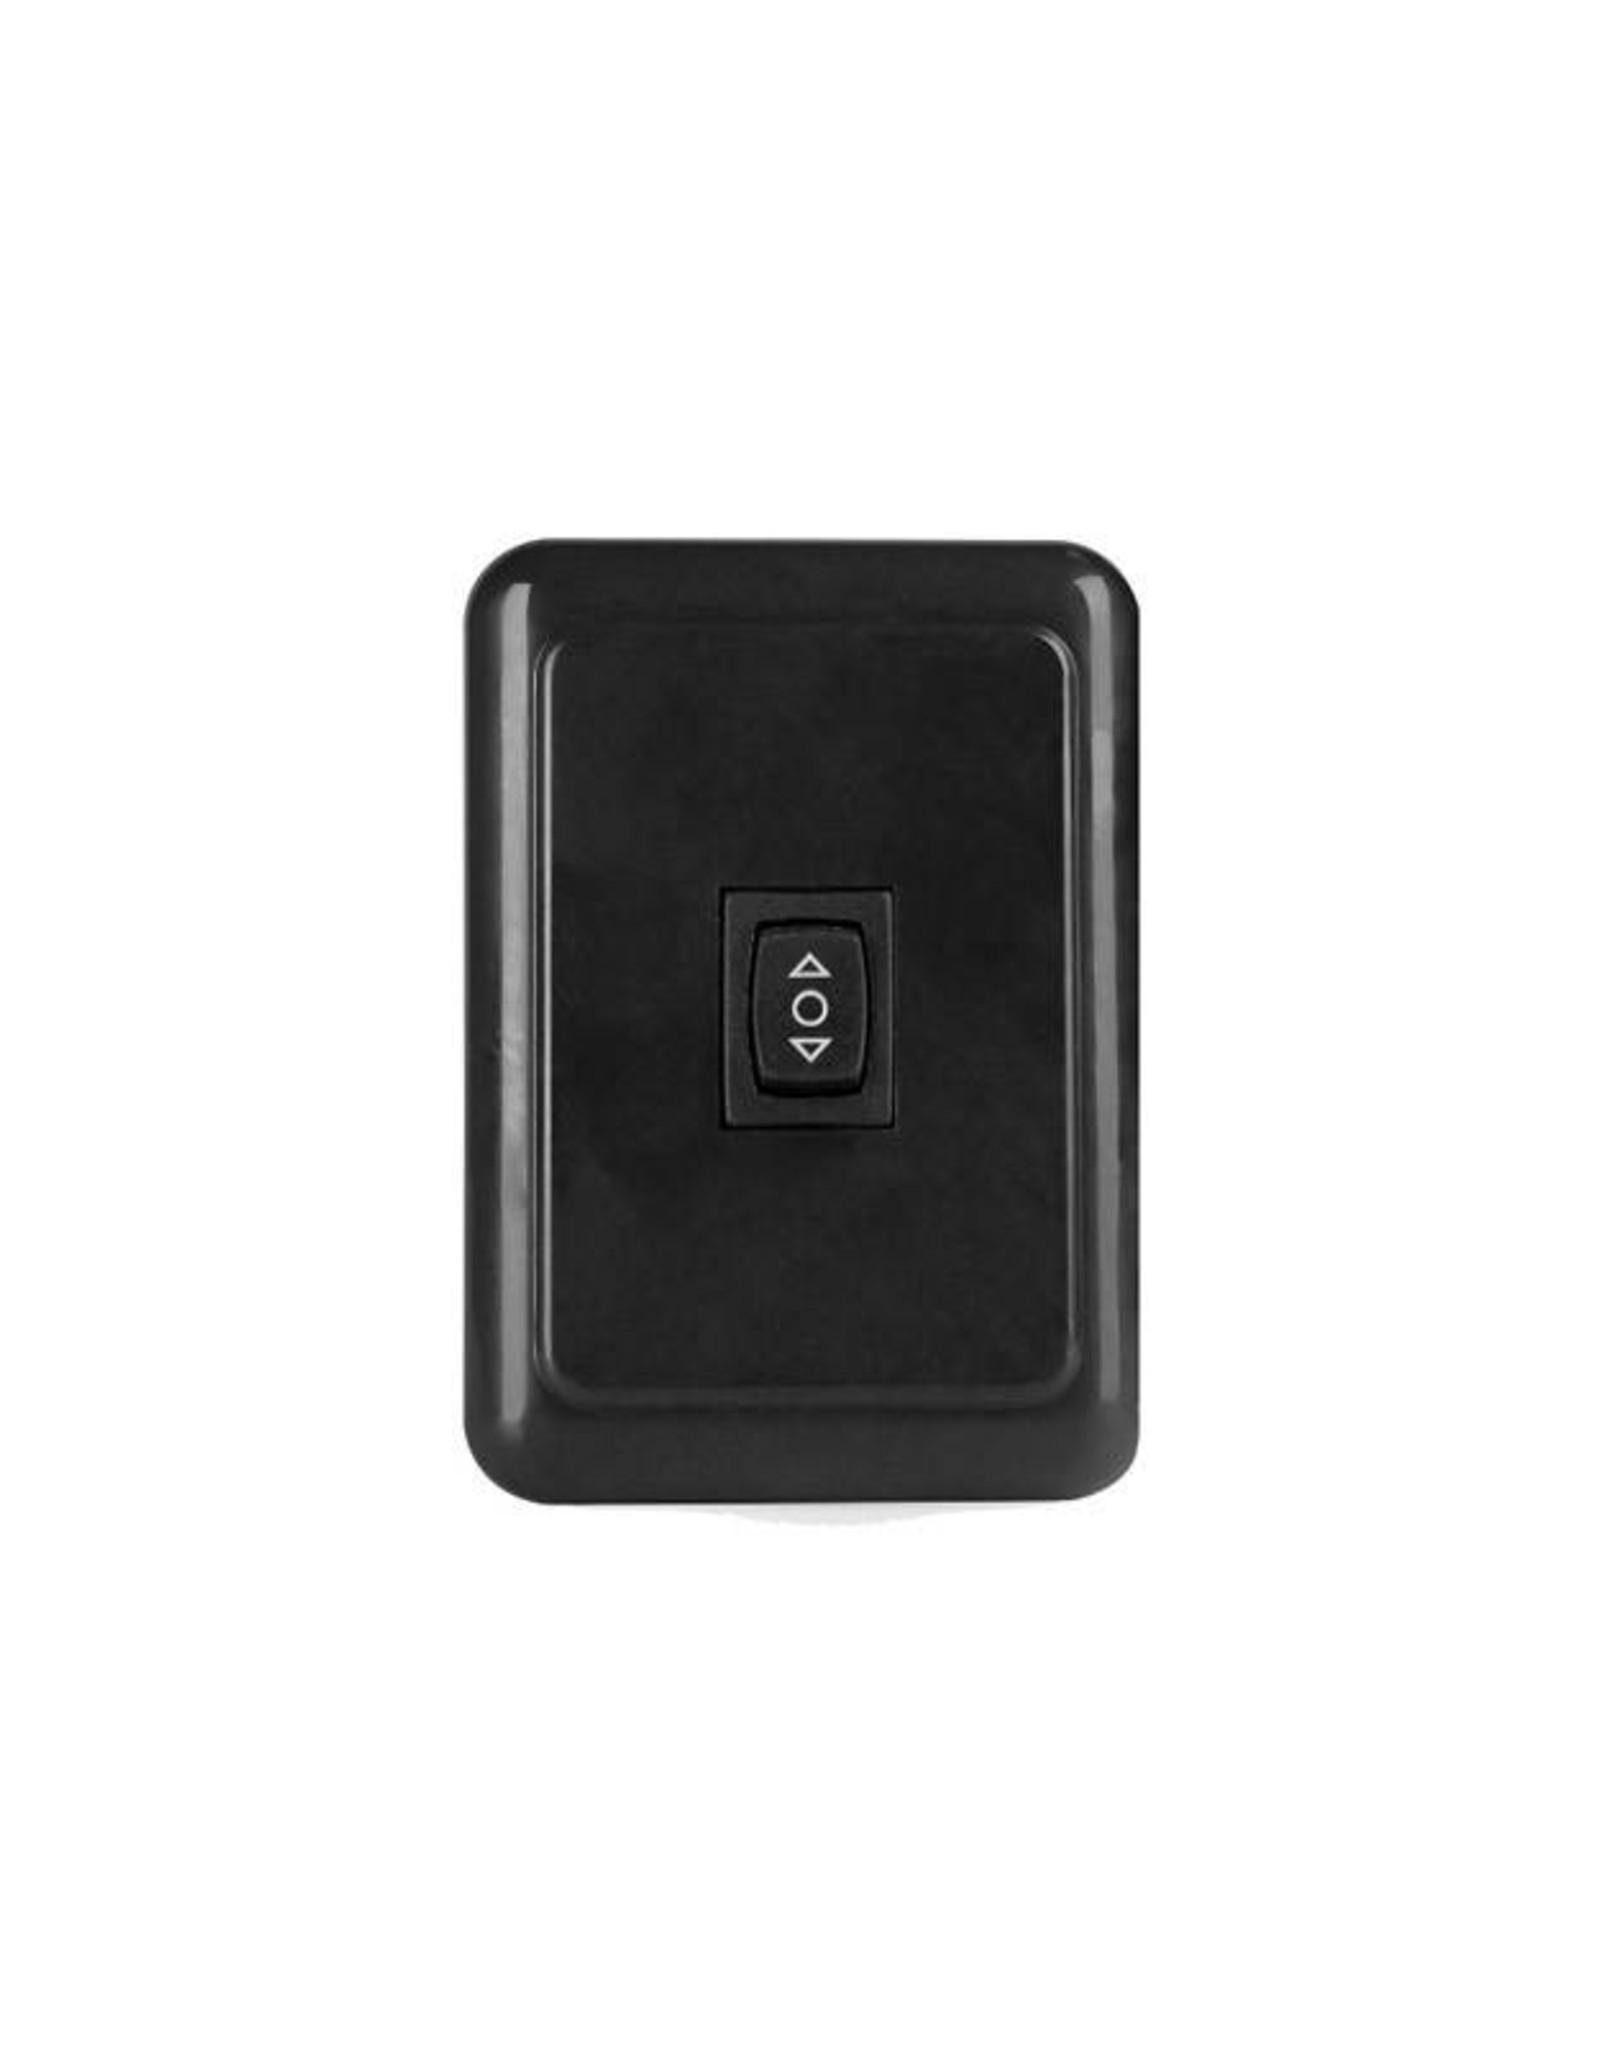 Black Dimmer switch 18-7681 (016-BL4000)